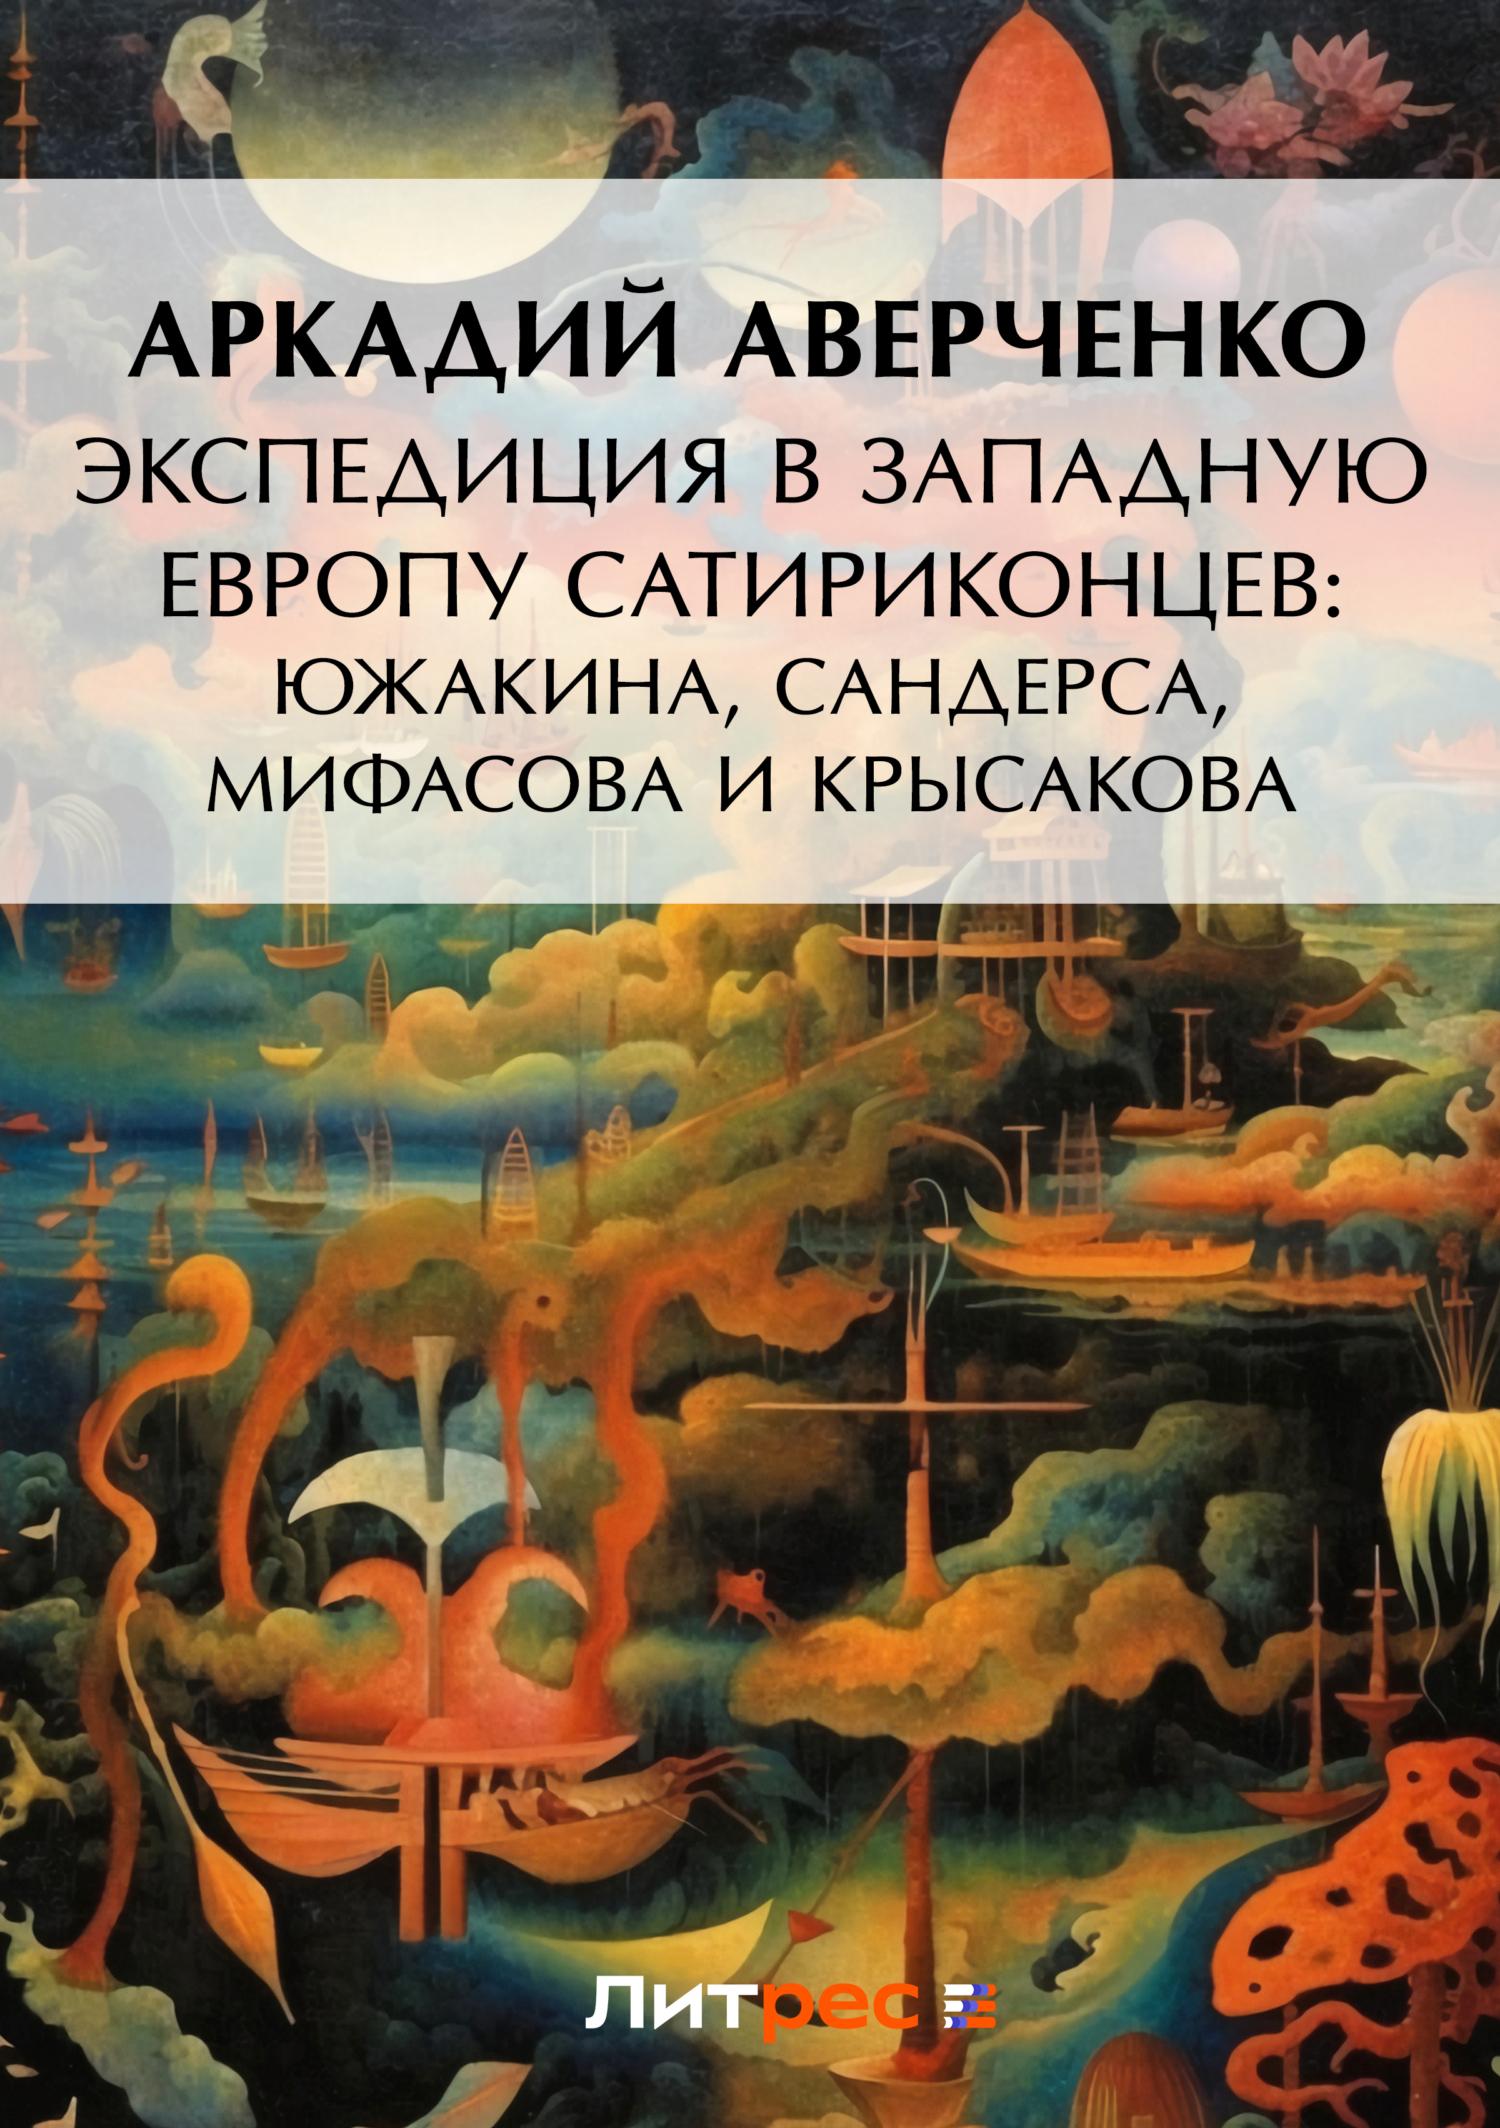 Аркадий Аверченко Экспедиция в Западную Европу сатириконцев: Южакина, Сандерса, Мифасова и Крысакова